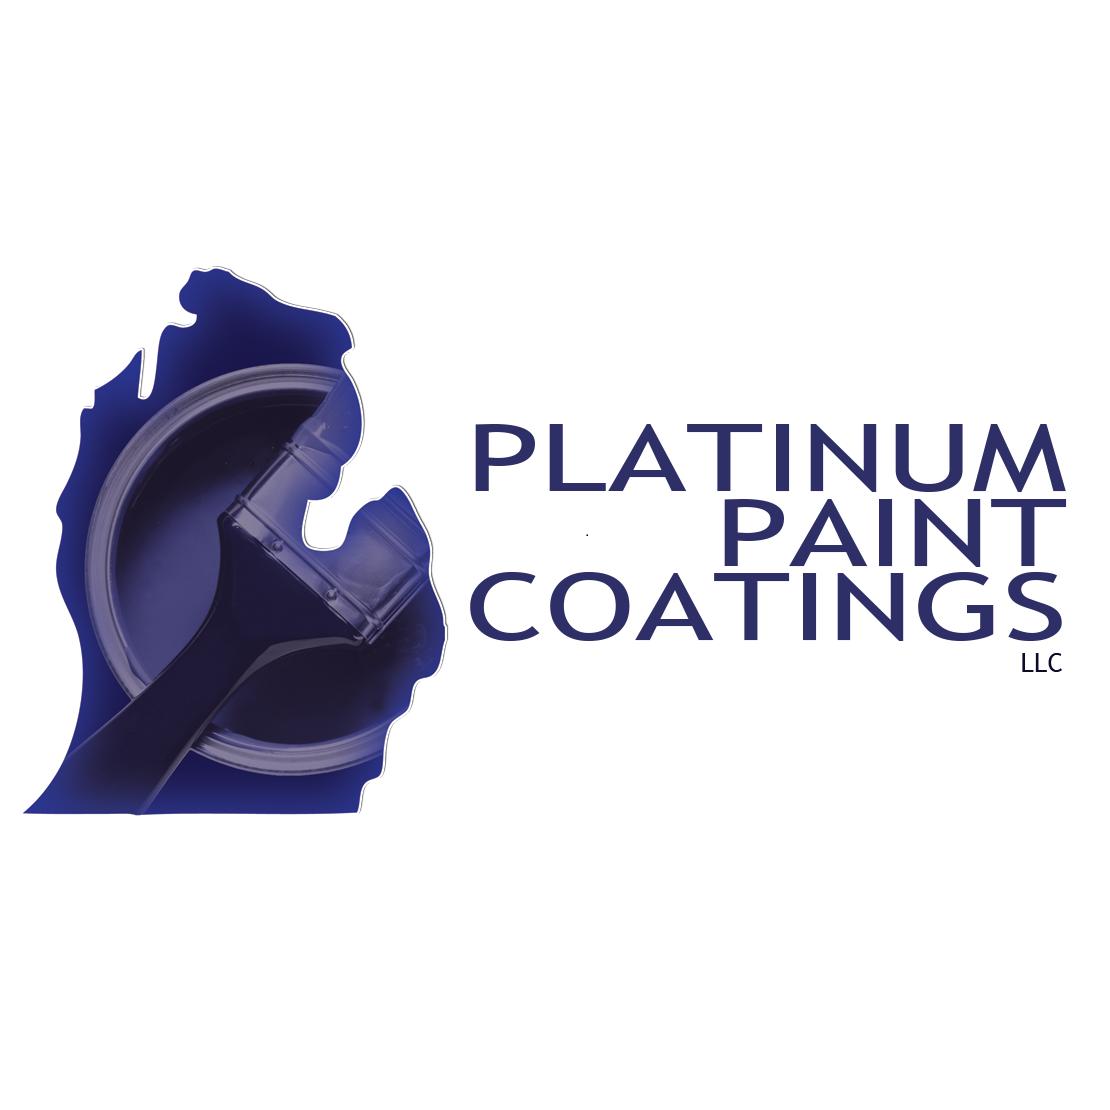 Platinum Paint Coatings, LLC